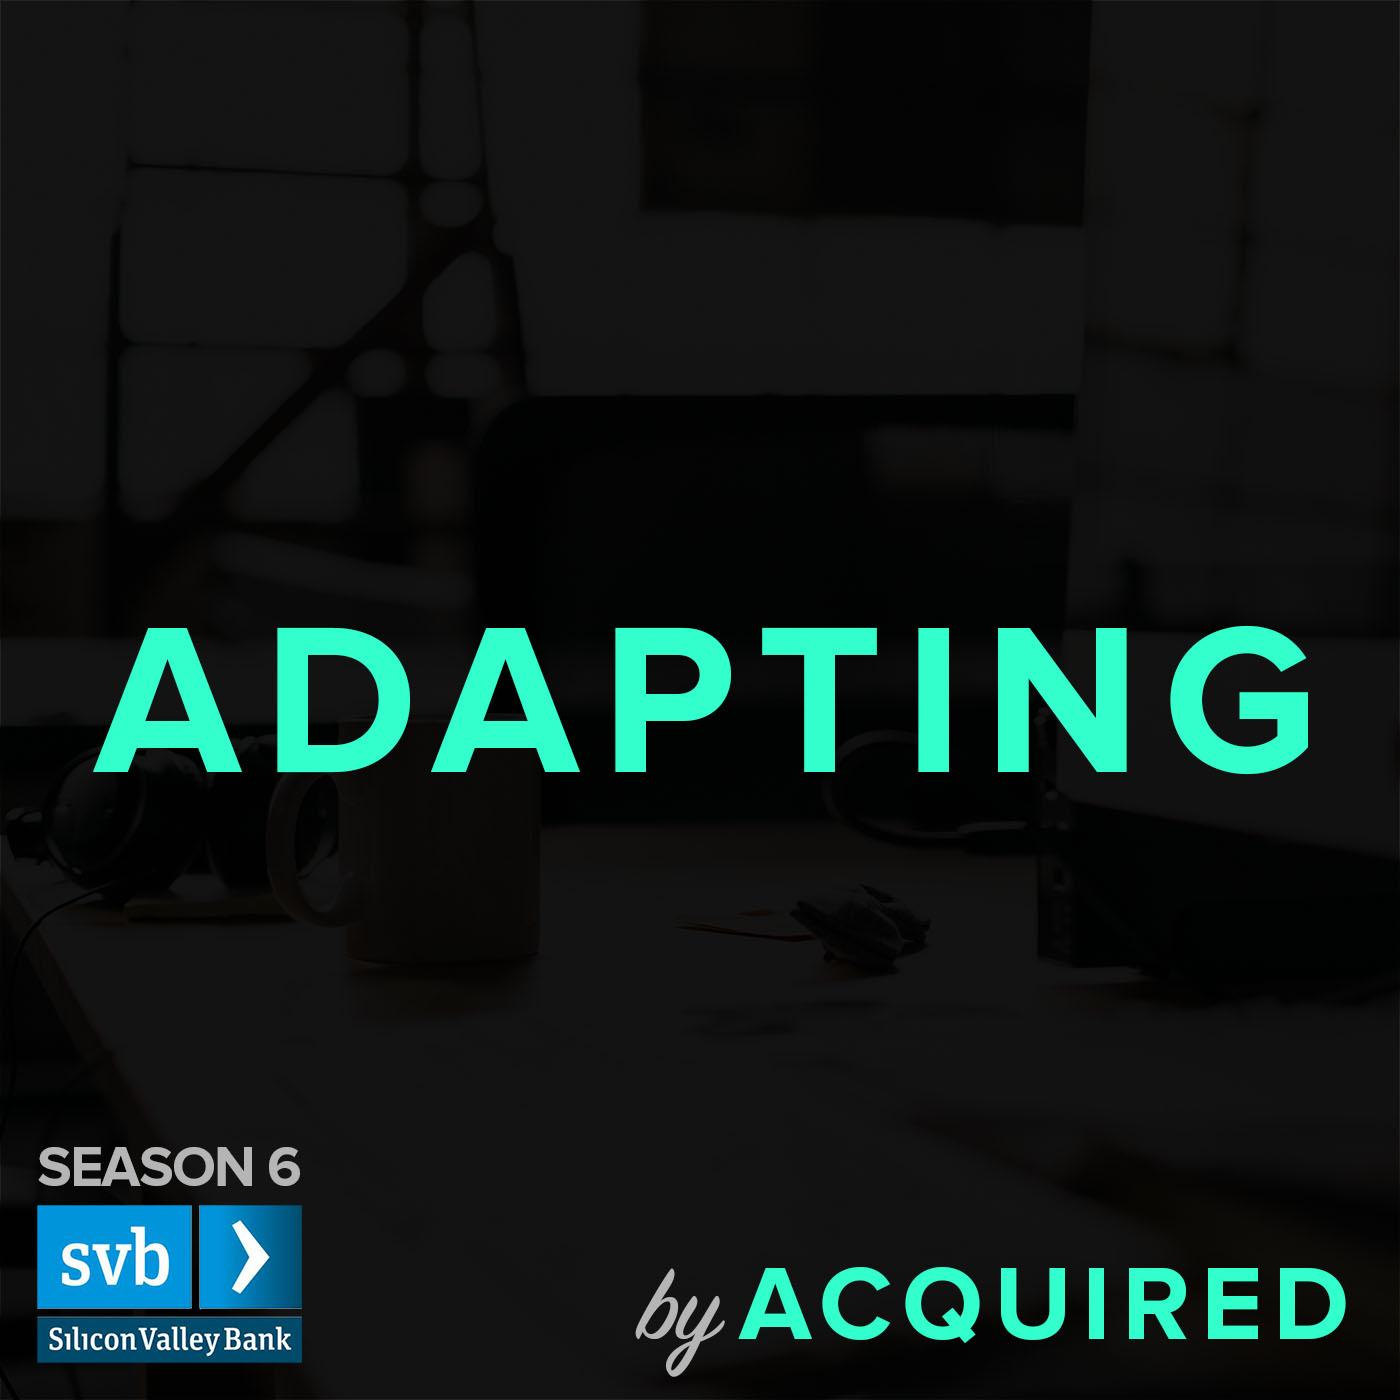 Adapting Episode 1: Canlis